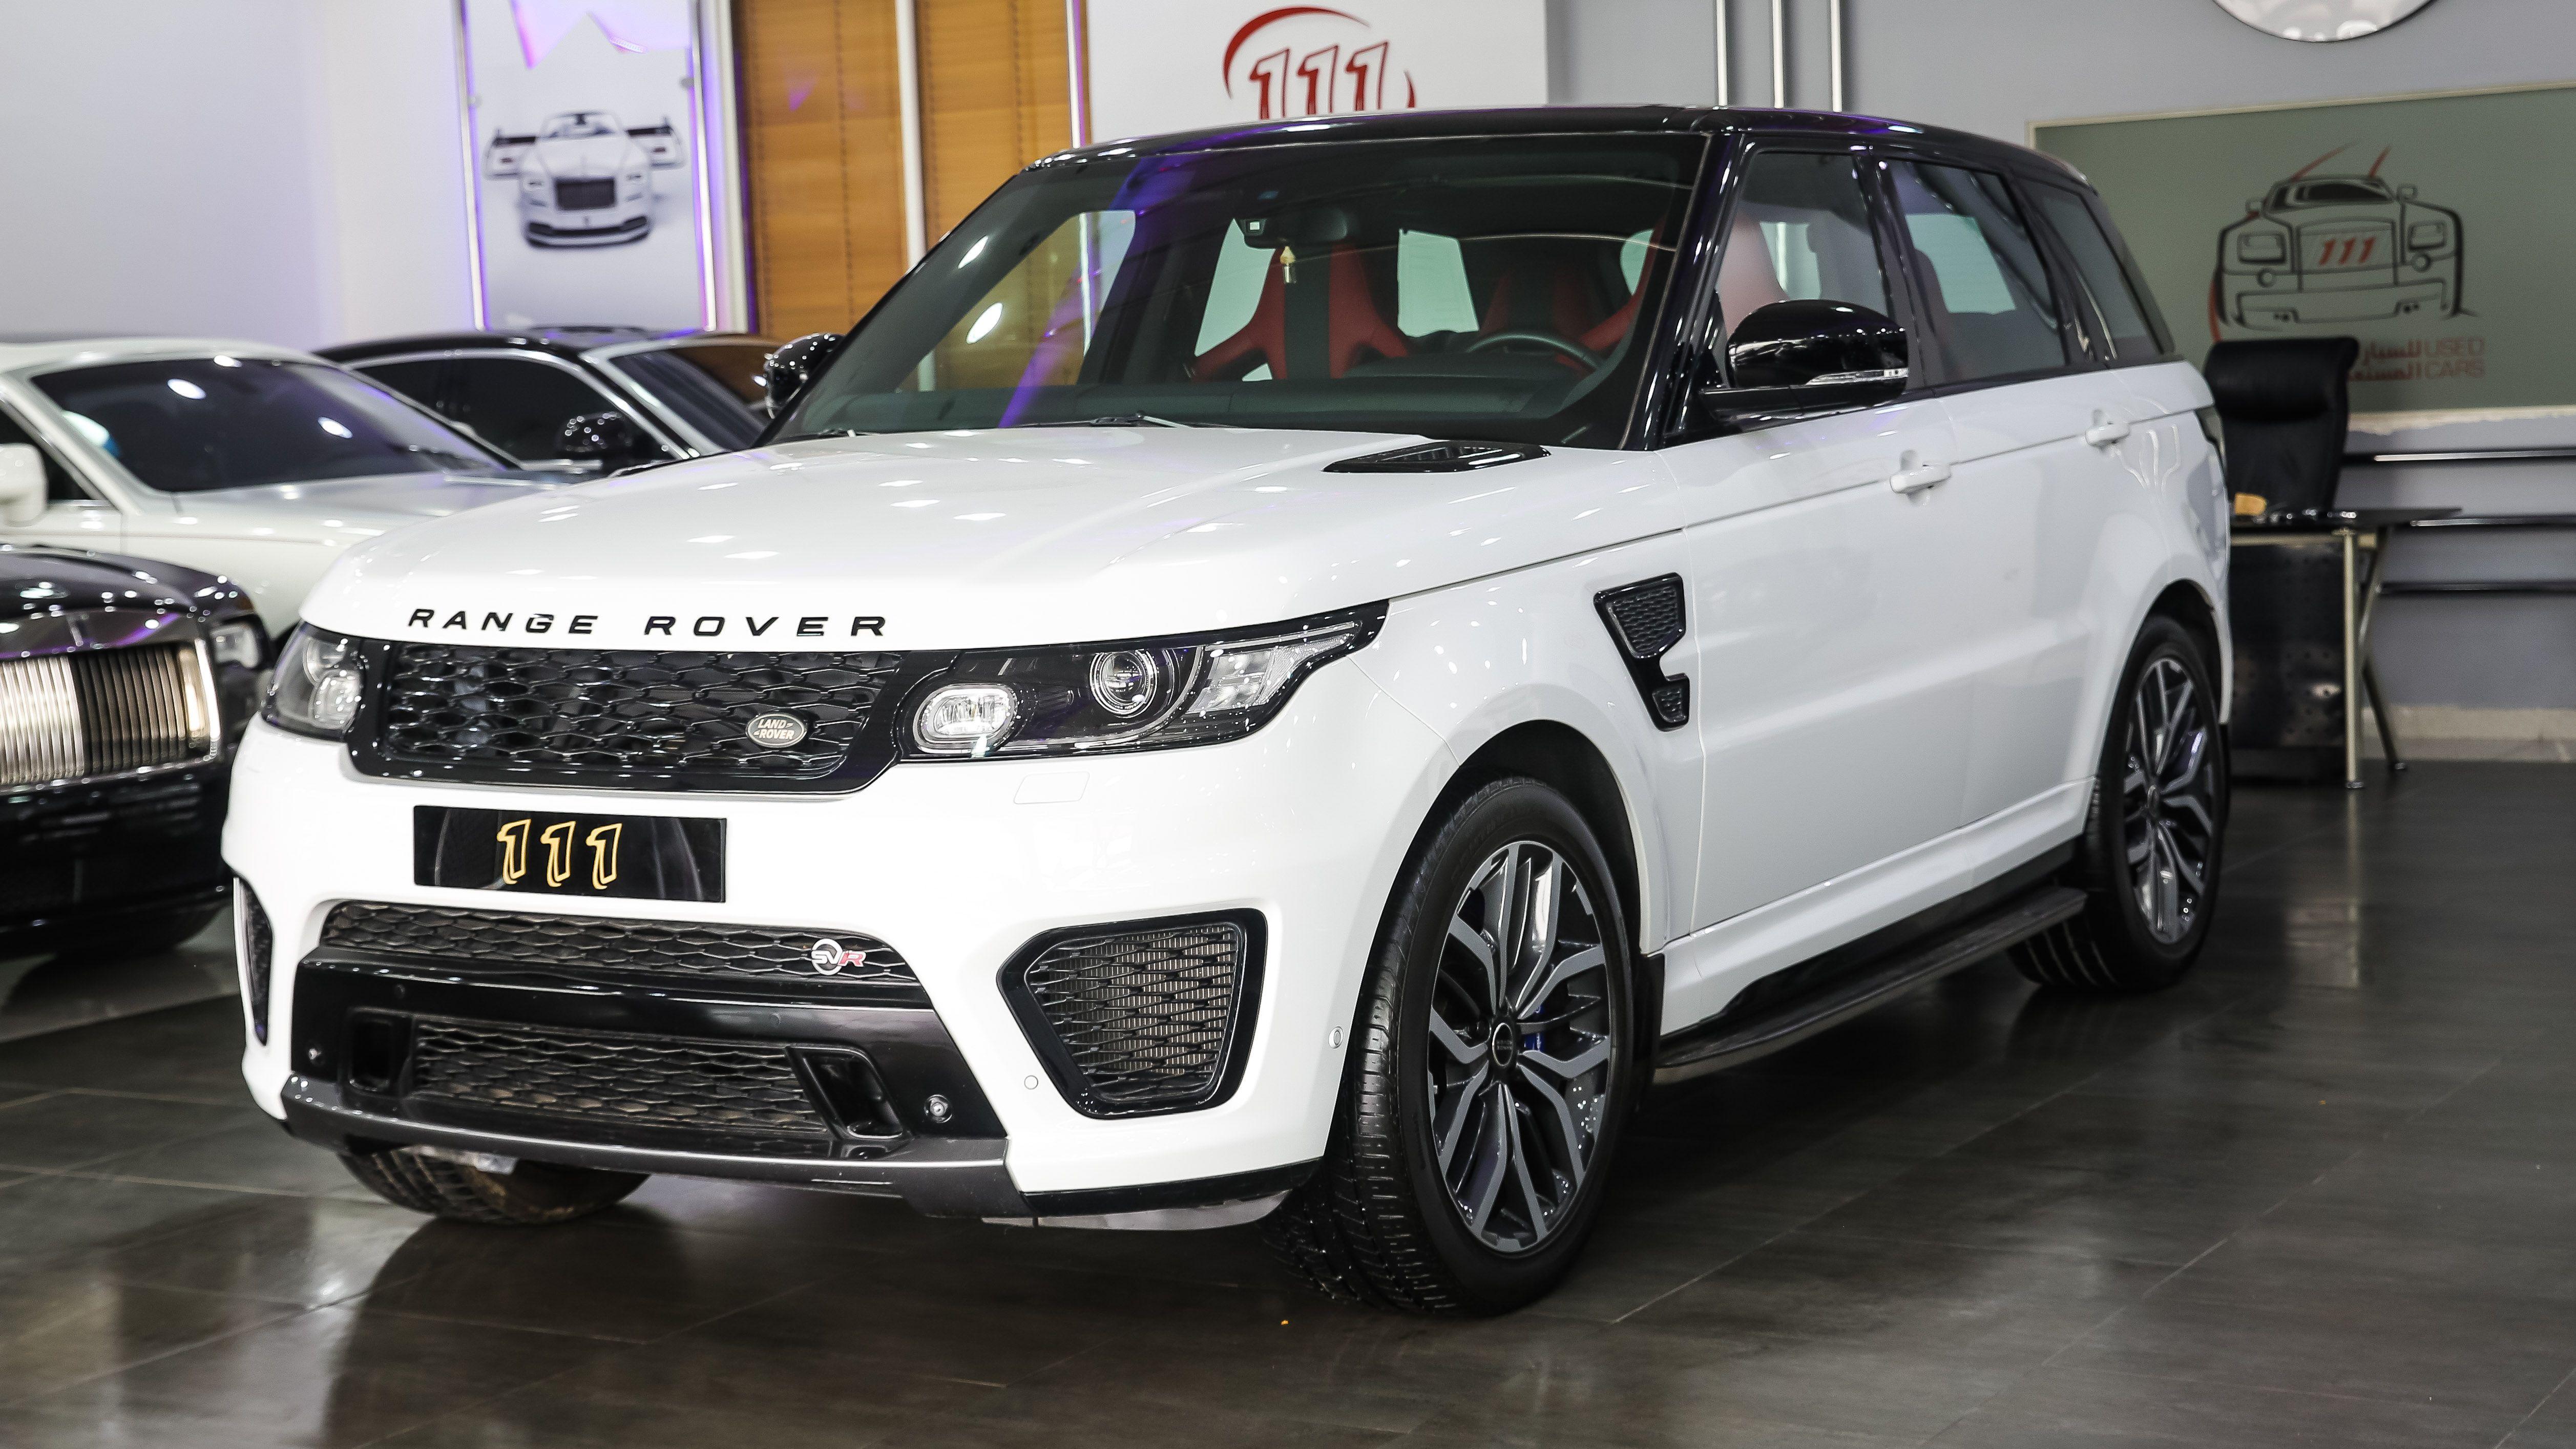 2015 Range Rover Sport SVR / GCC Specifications in 2020